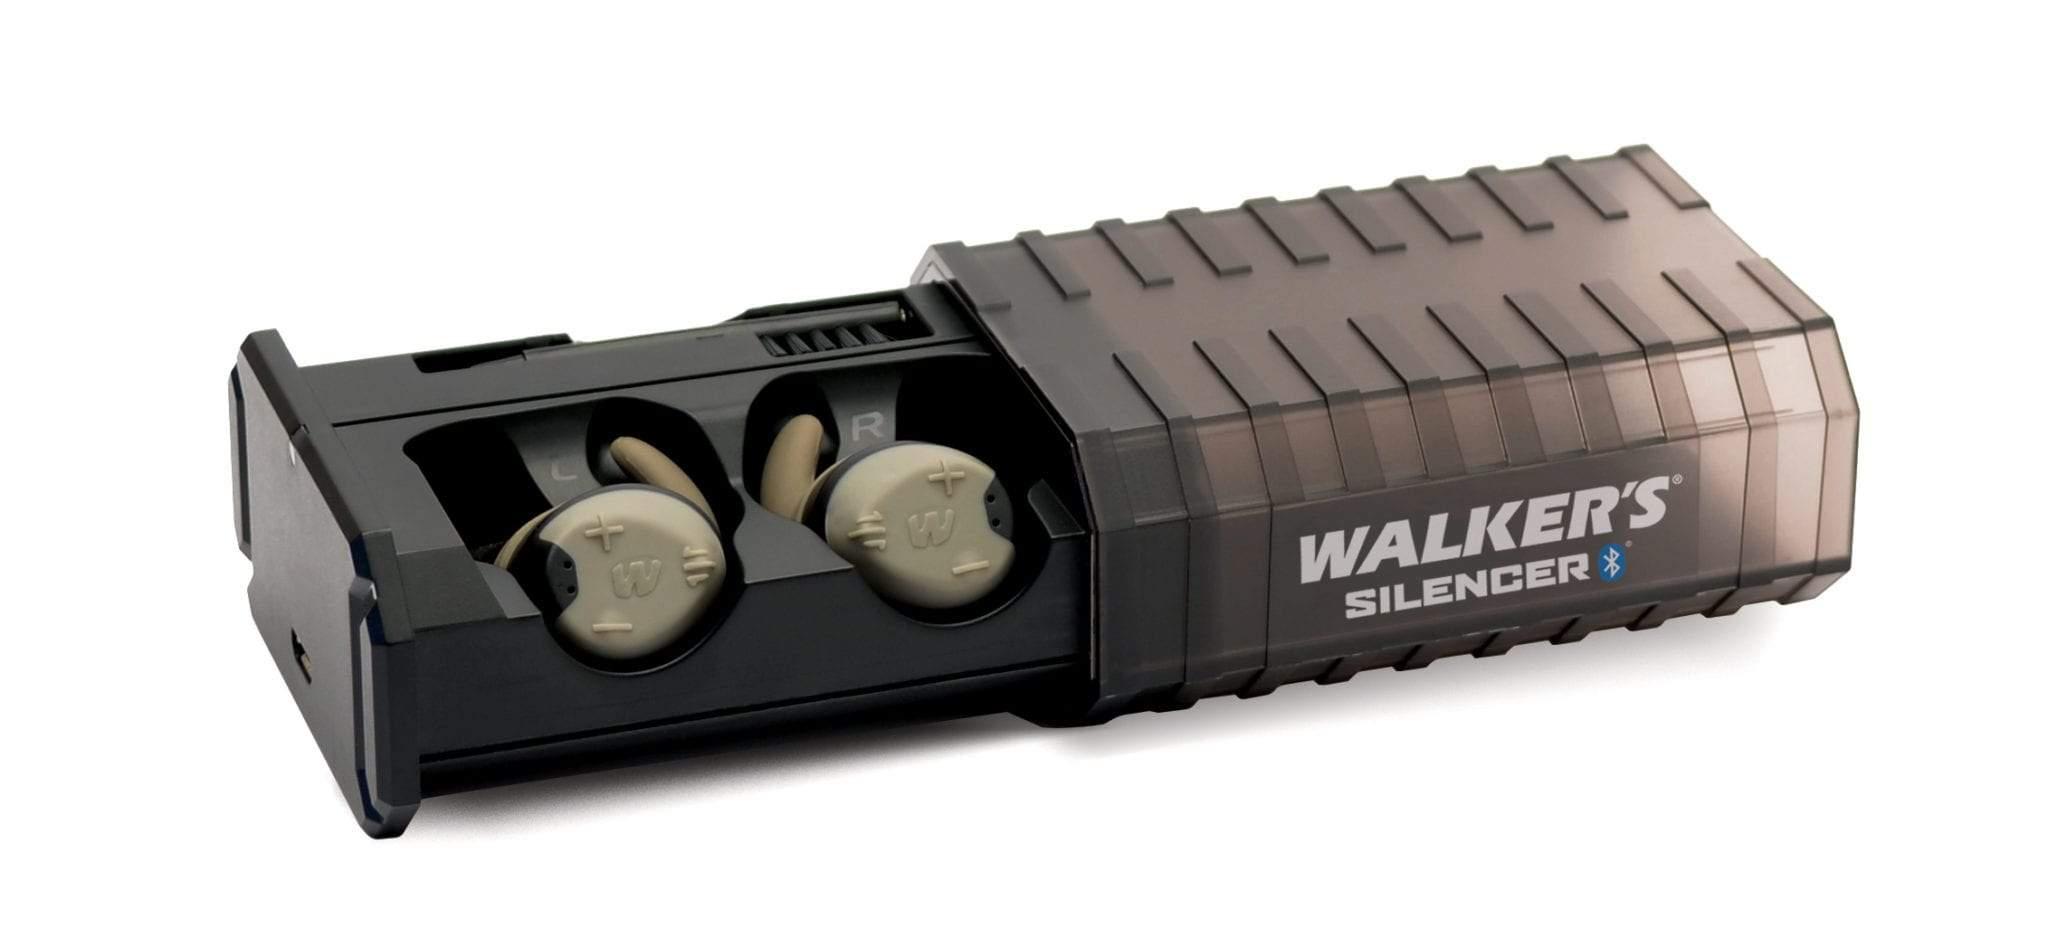 Walker's Silencer Bluetooth Rechargeable In the Ear Electronic Ear Buds/Ear Muffs #GWP-SLCR-BT - Australian Tactical Precision